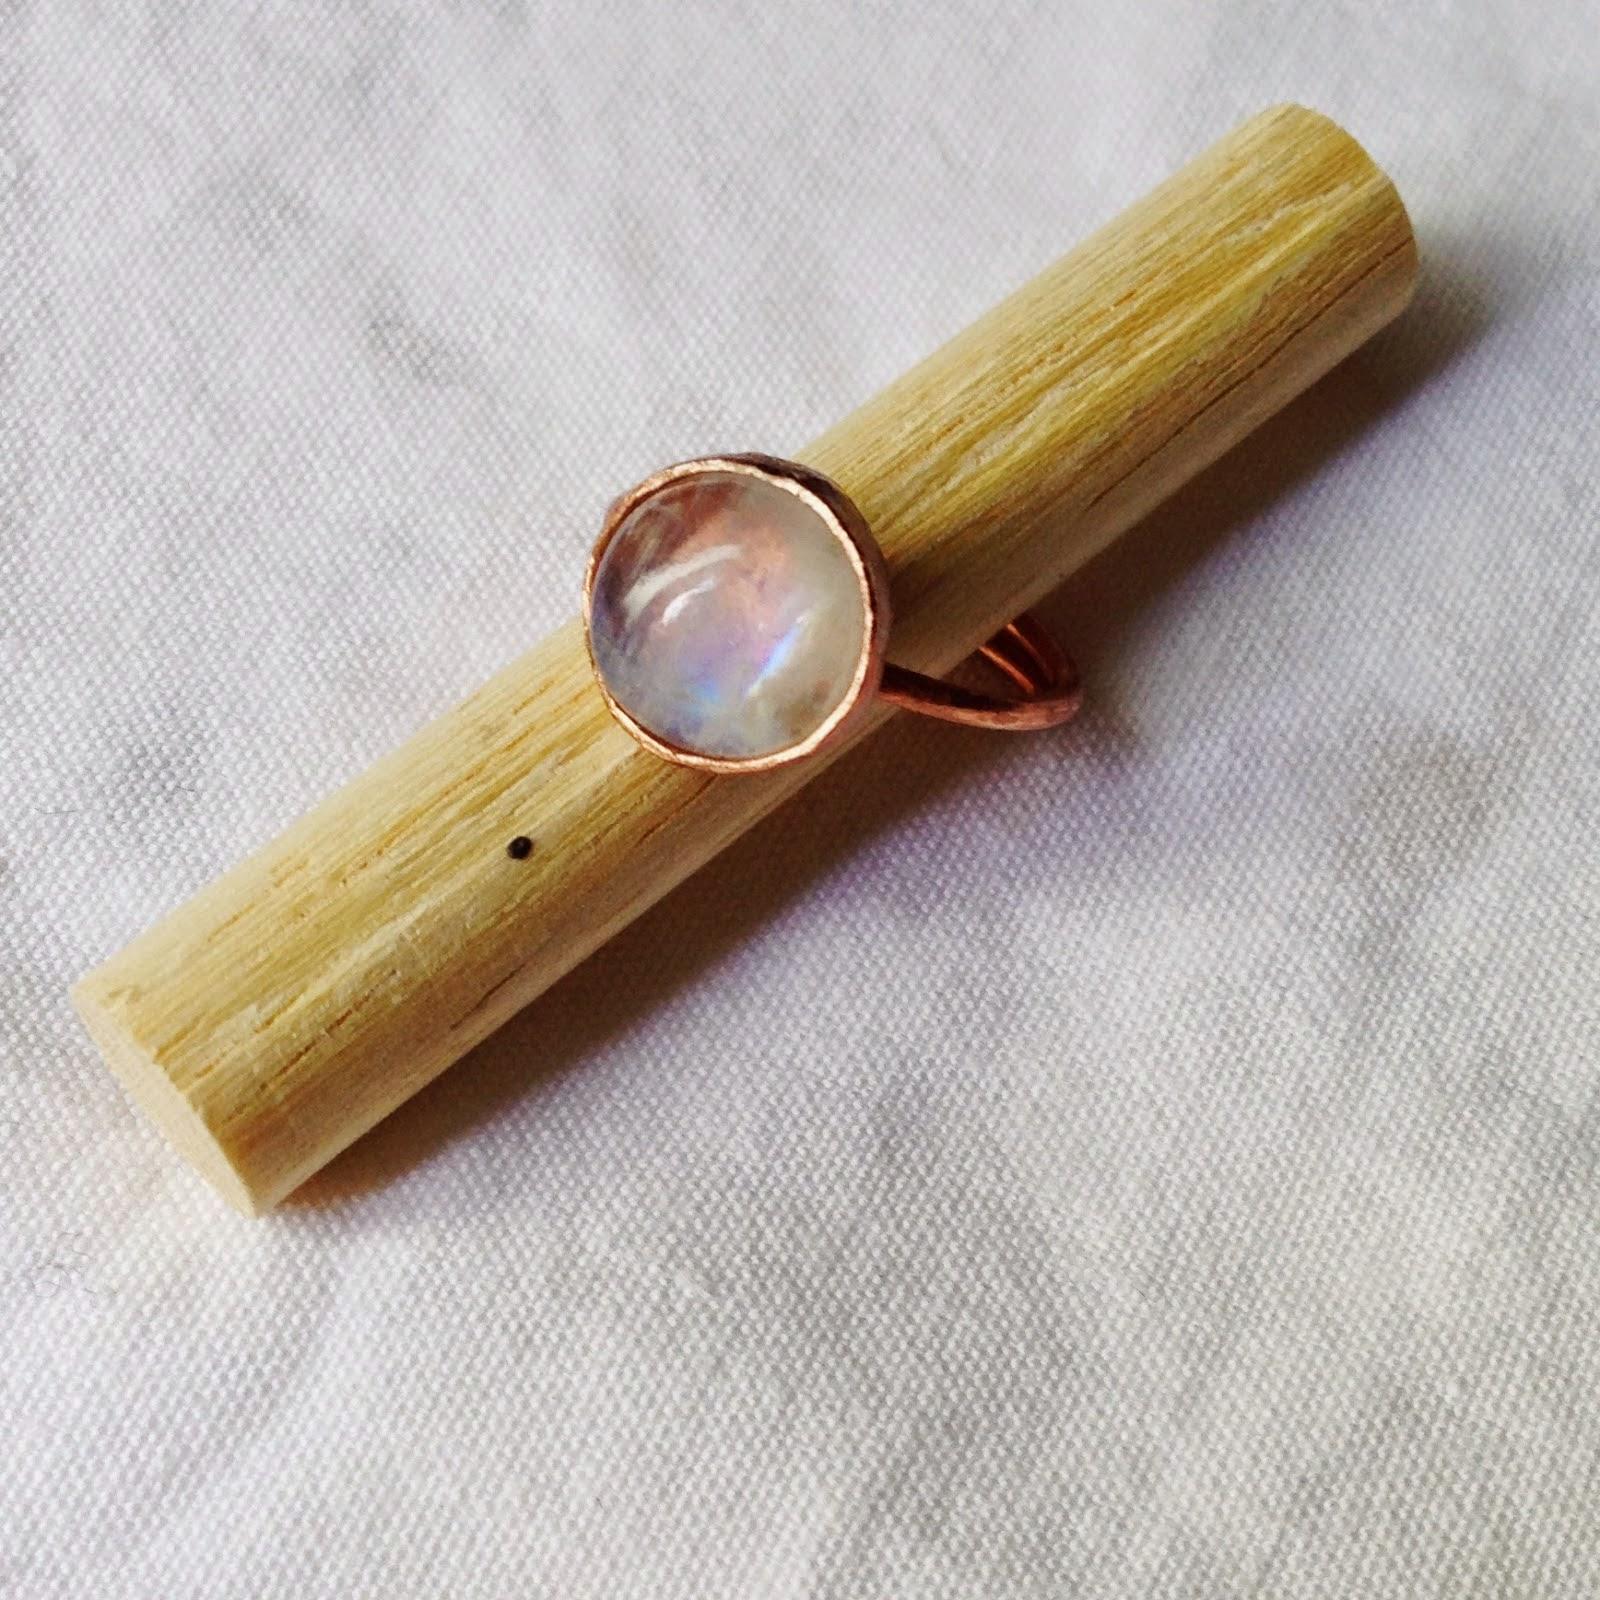 http://shapingmetal.blogspot.it/2014/10/anello-rame-e-labradorite-bianca.html